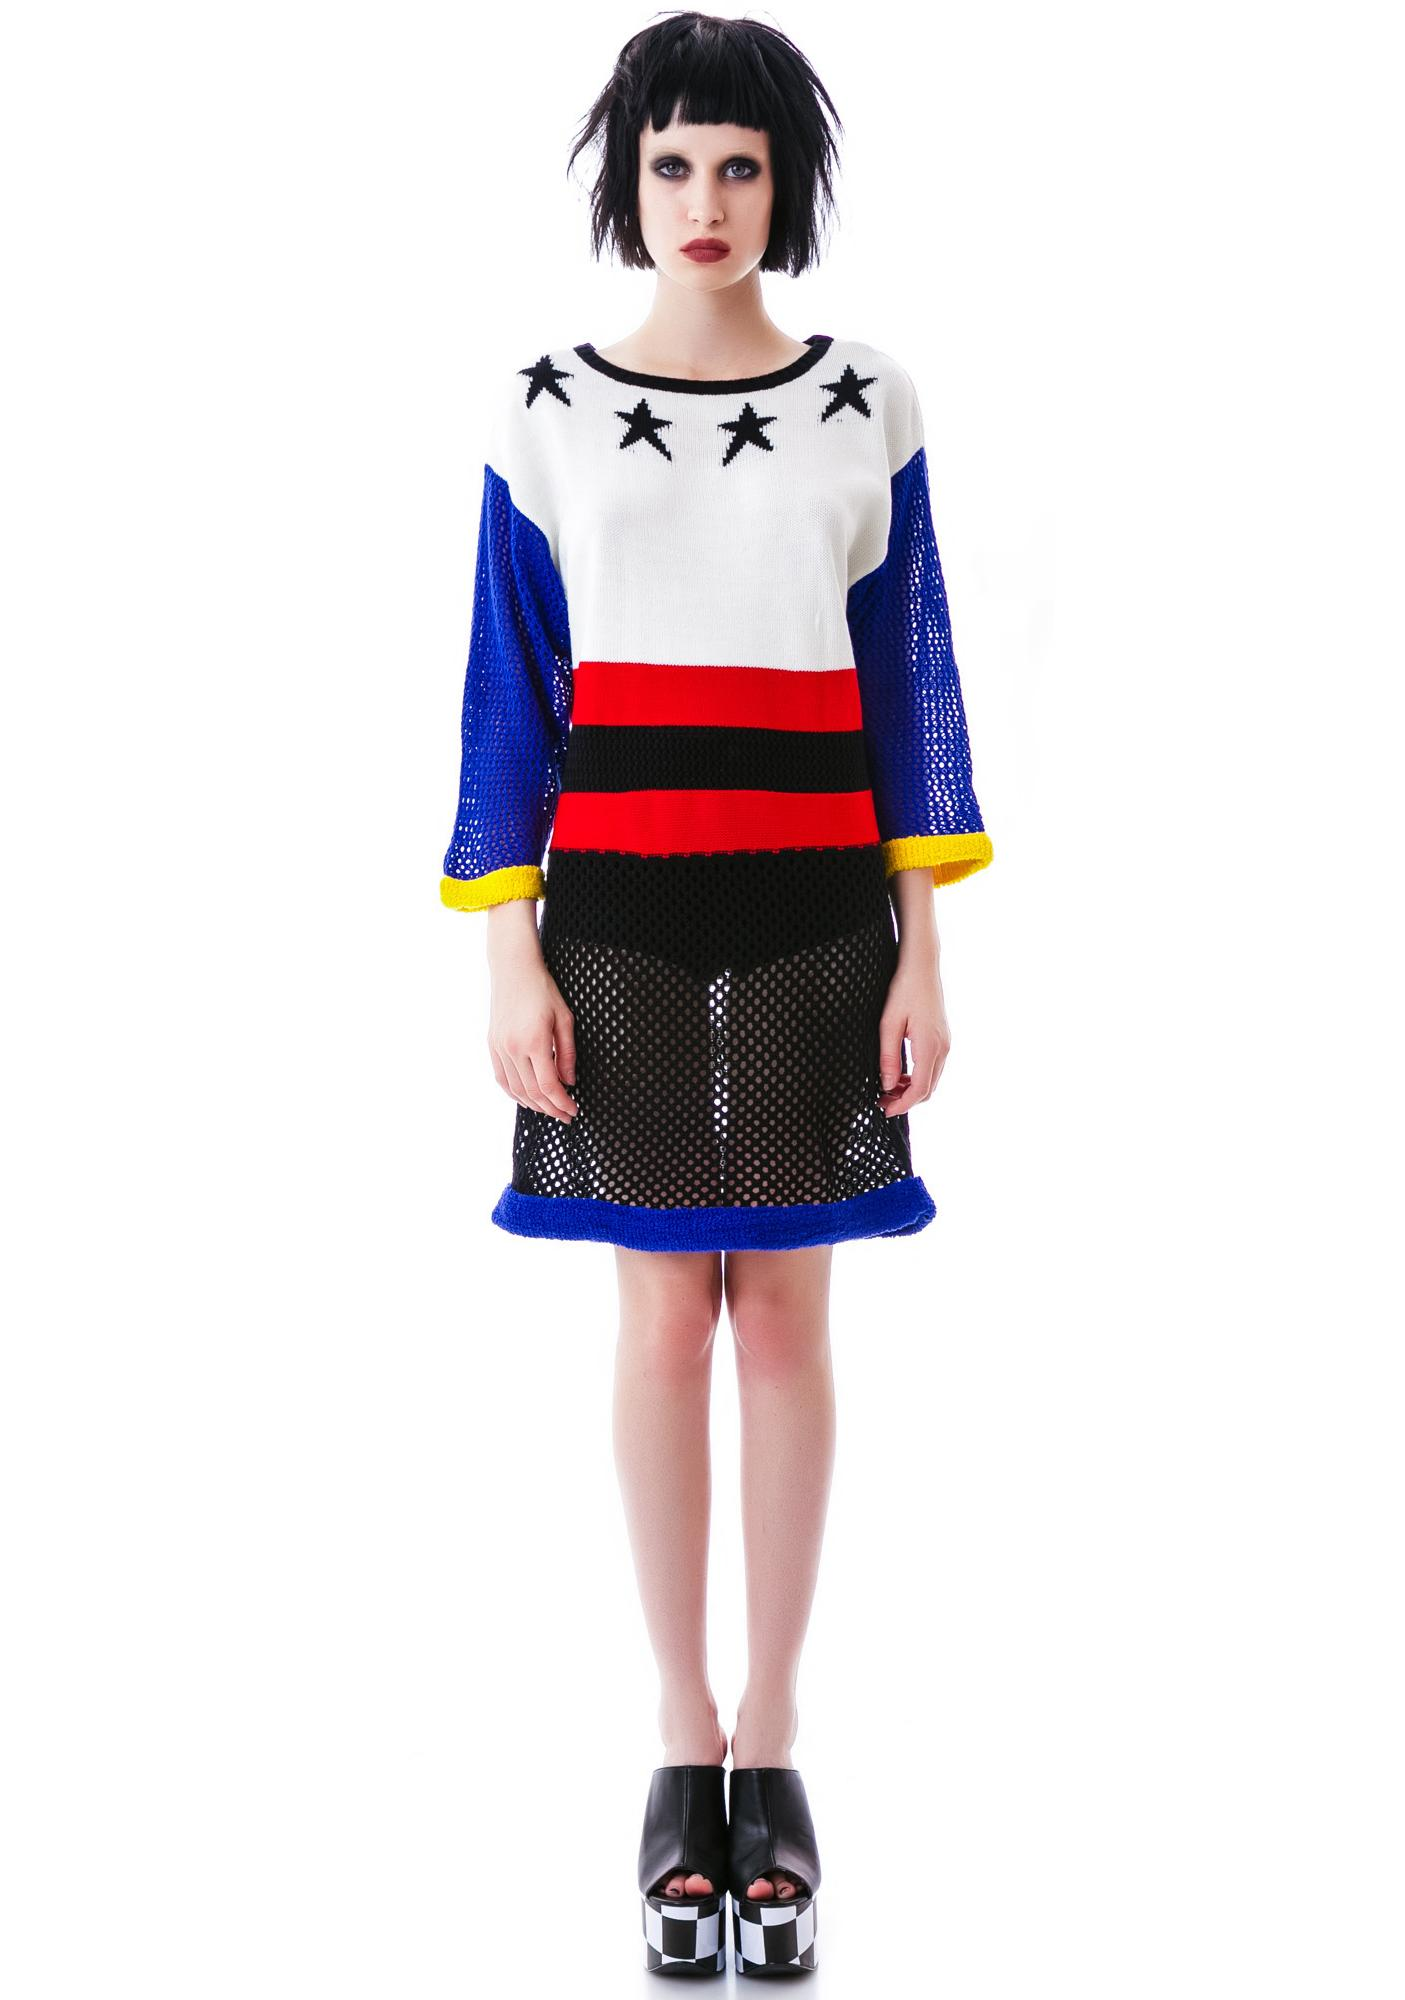 Salute Yer Stars Sweater Dress